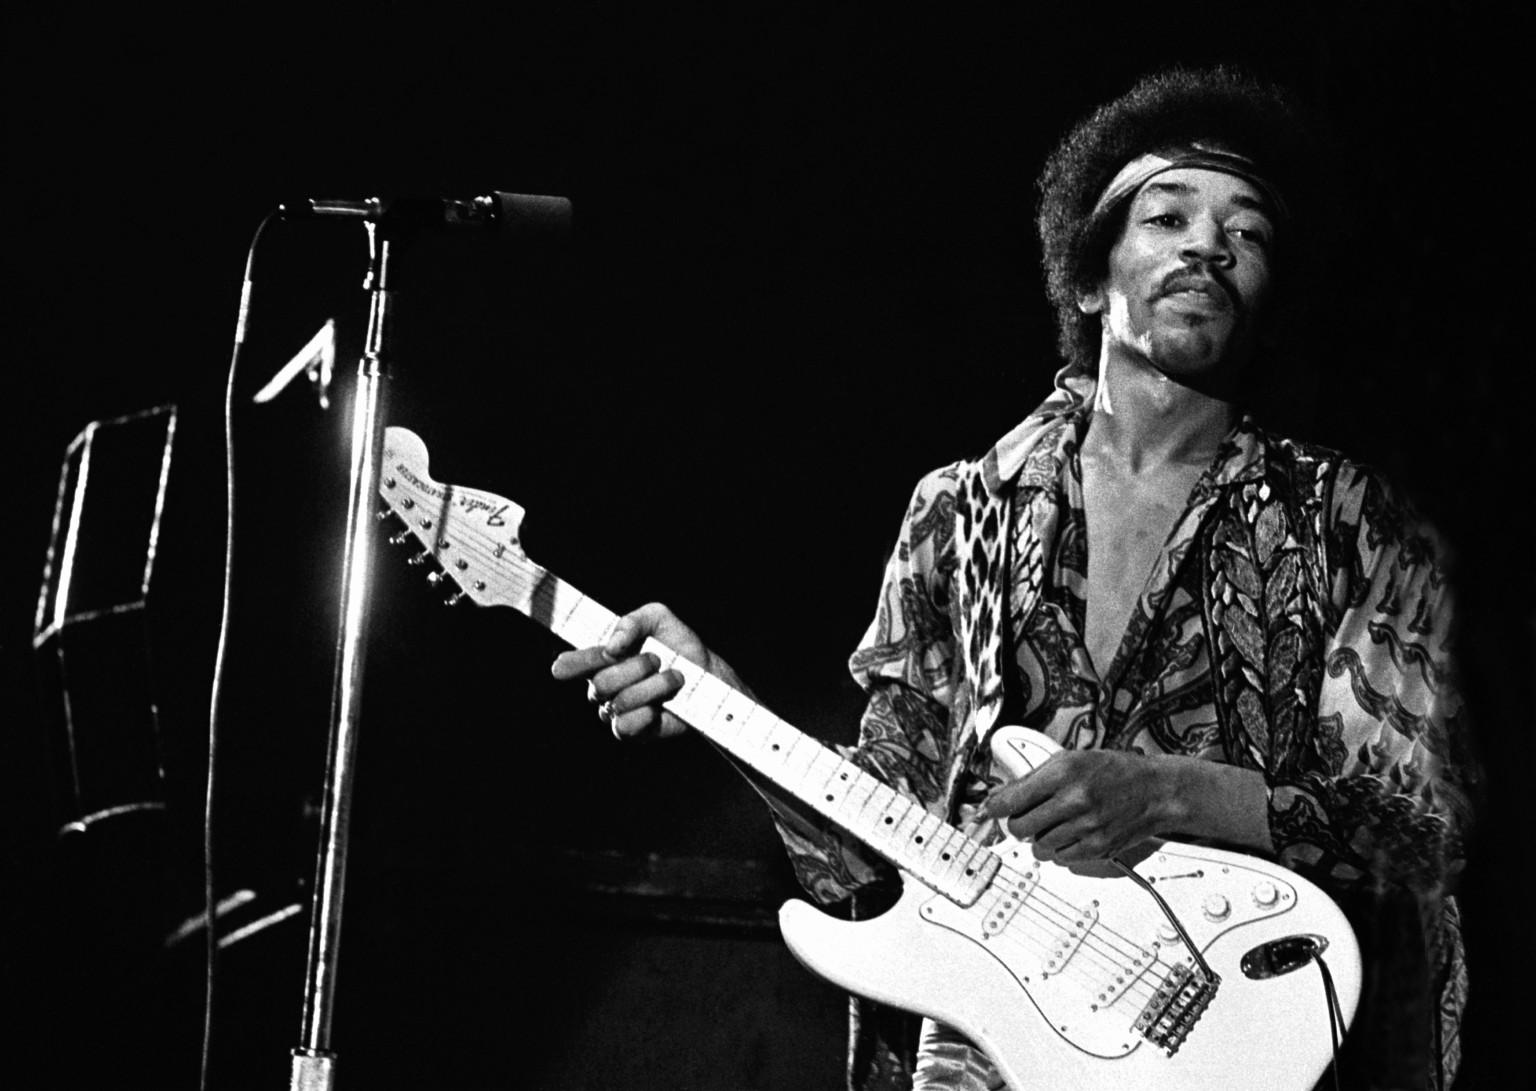 Free Download The Best Jimi Hendrix Wallpapers 1536x1091